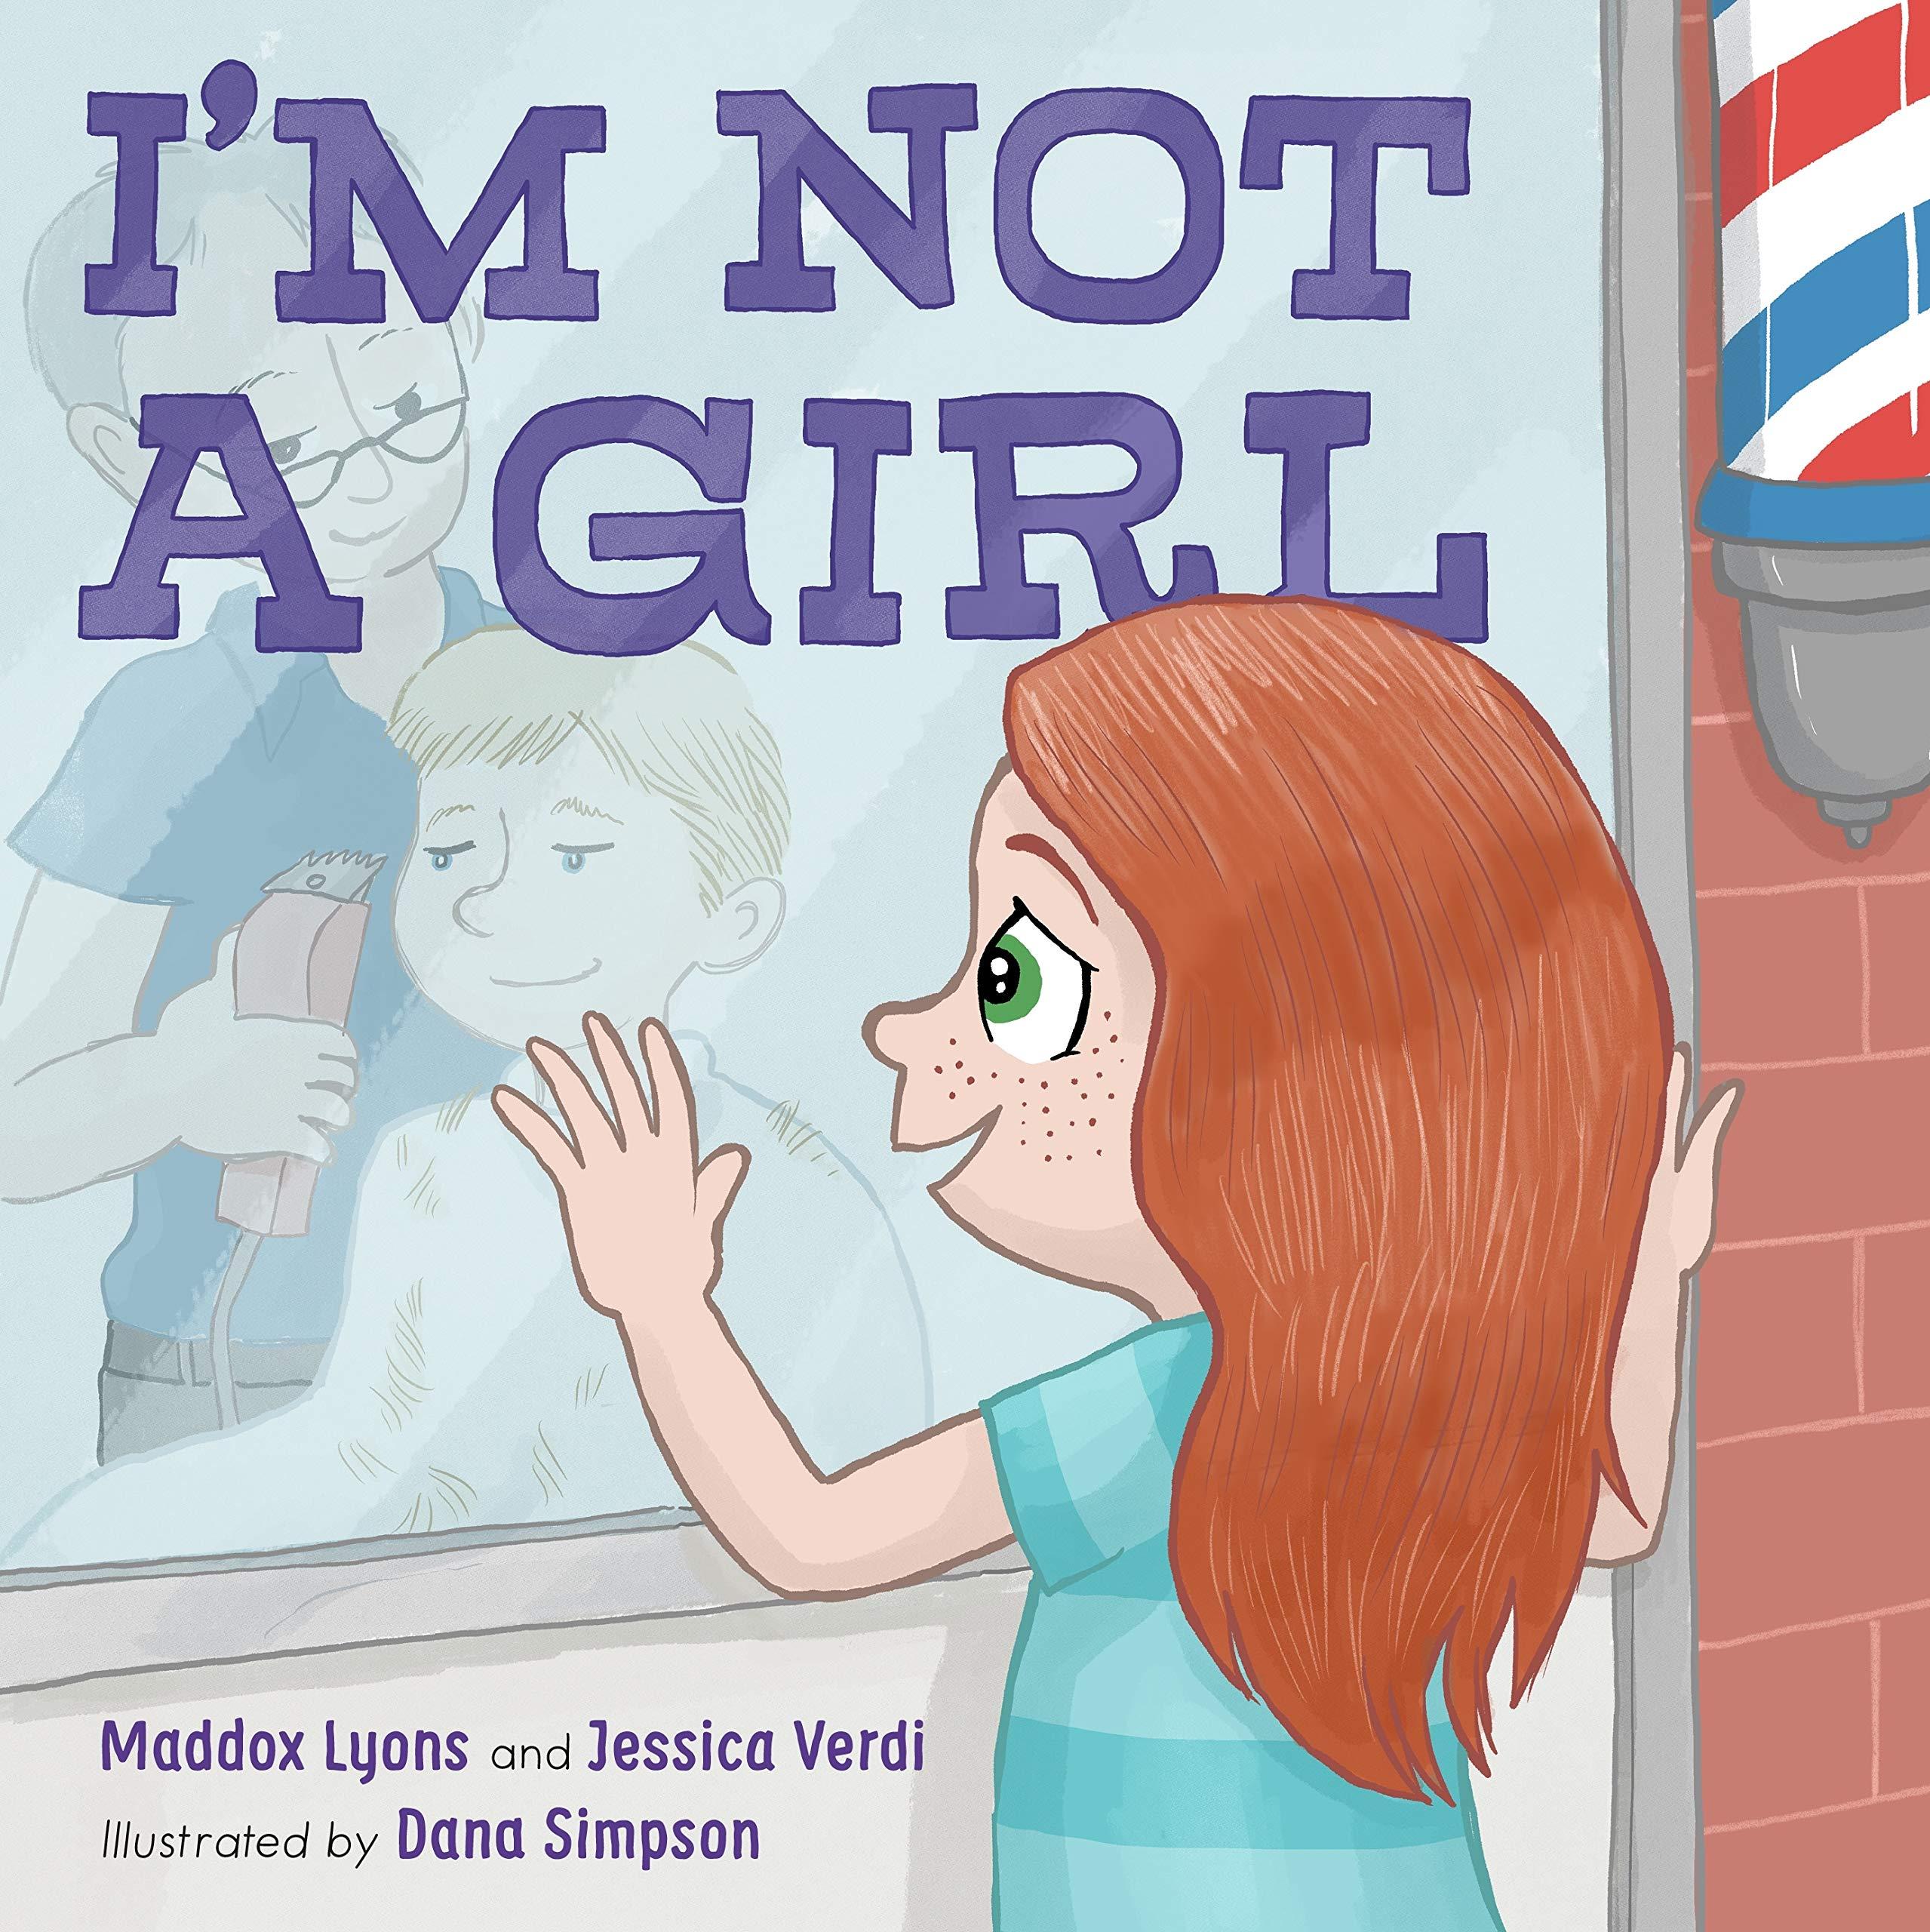 I'm Not a Girl: A Transgender Story: Lyons, Maddox, Verdi, Jessica,  Simpson, Dana: 9780374310684: Amazon.com: Books